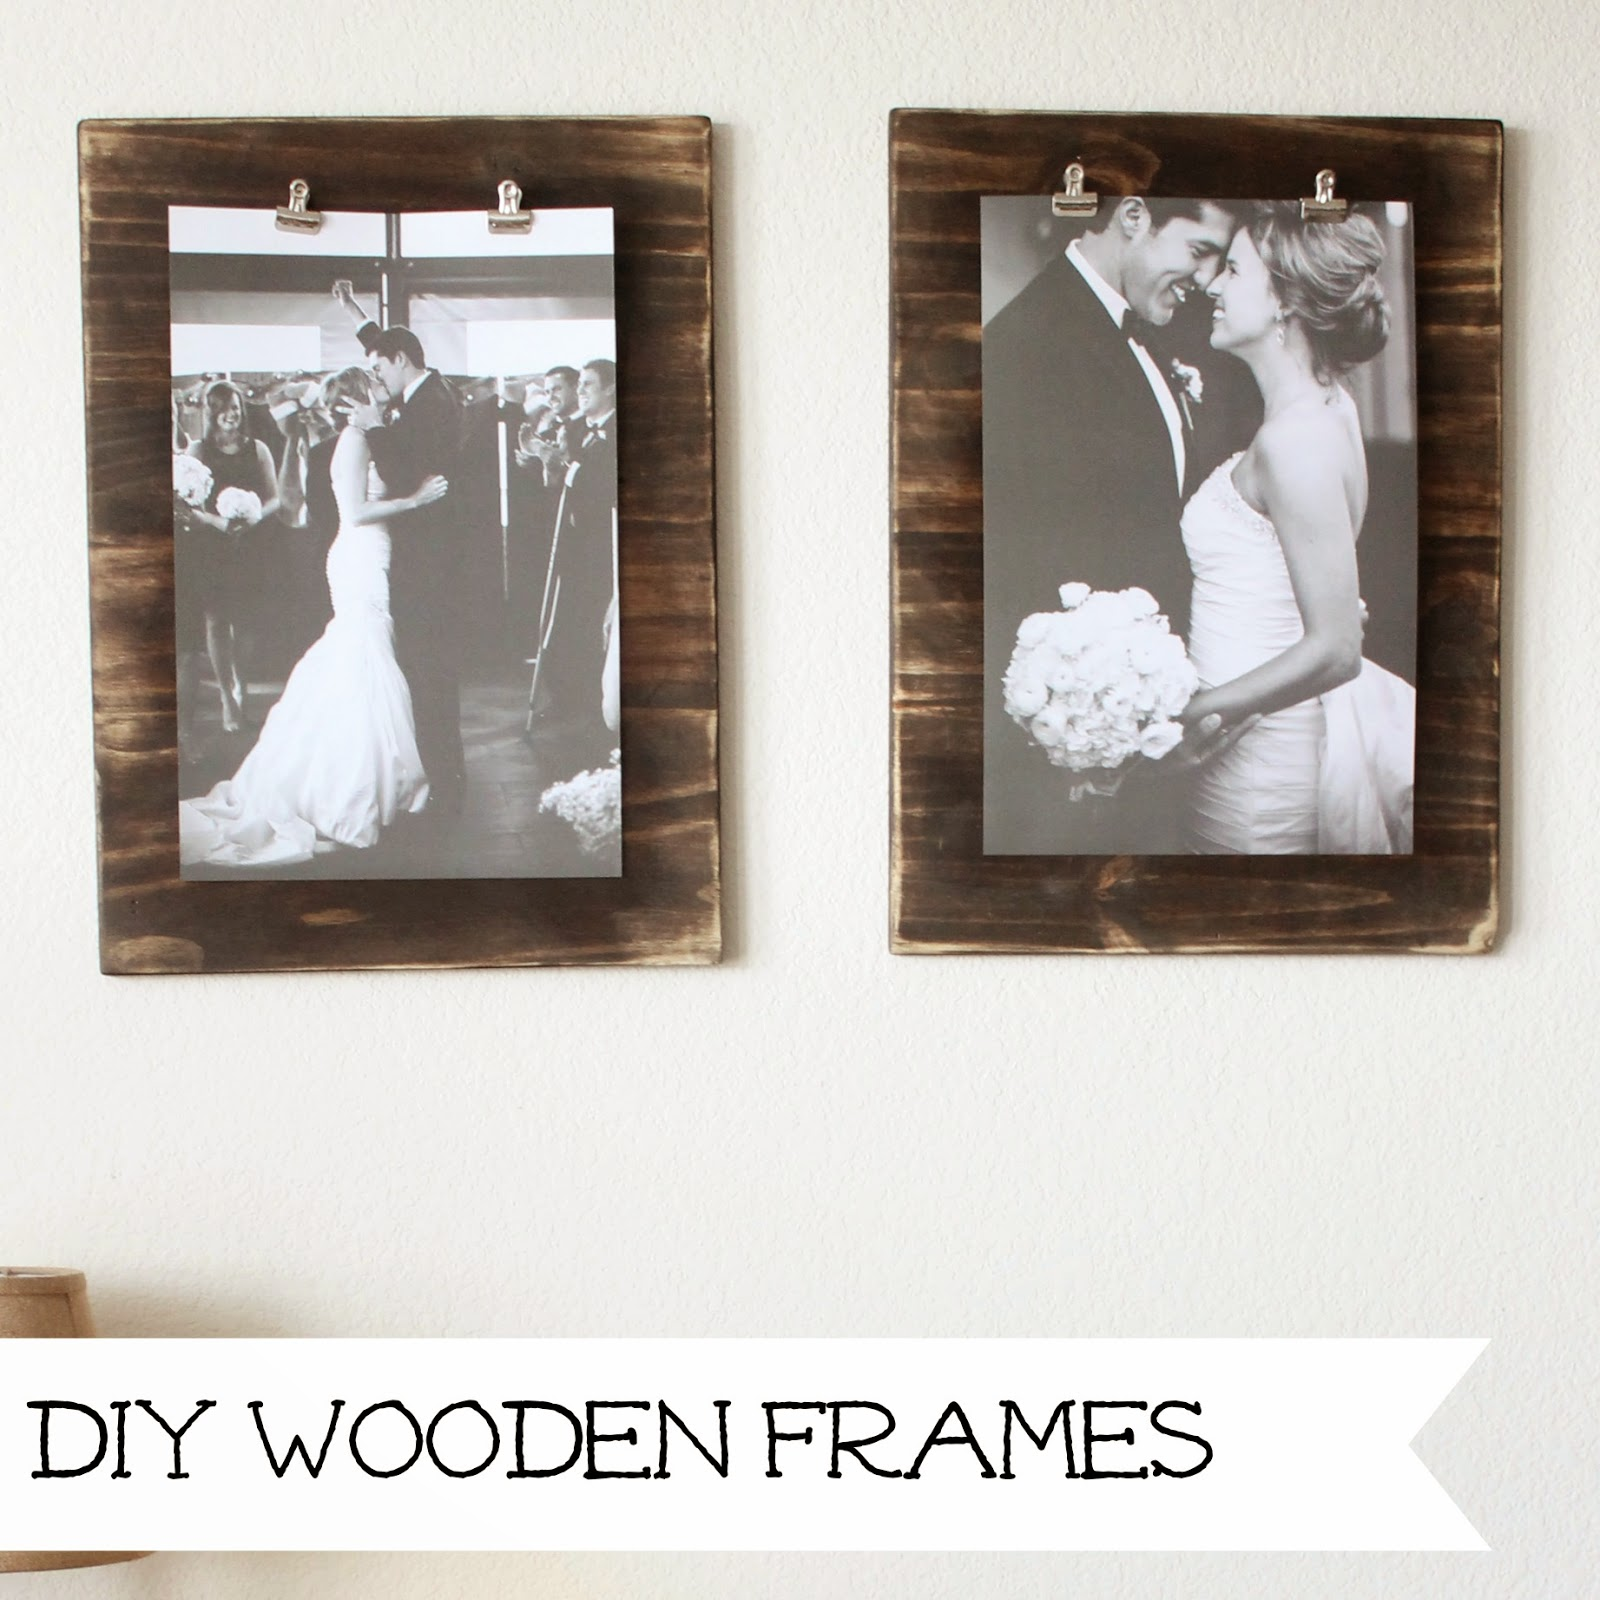 http://wonderfullymadebyleslie.blogspot.com/2014/04/diy-wooden-frames.html